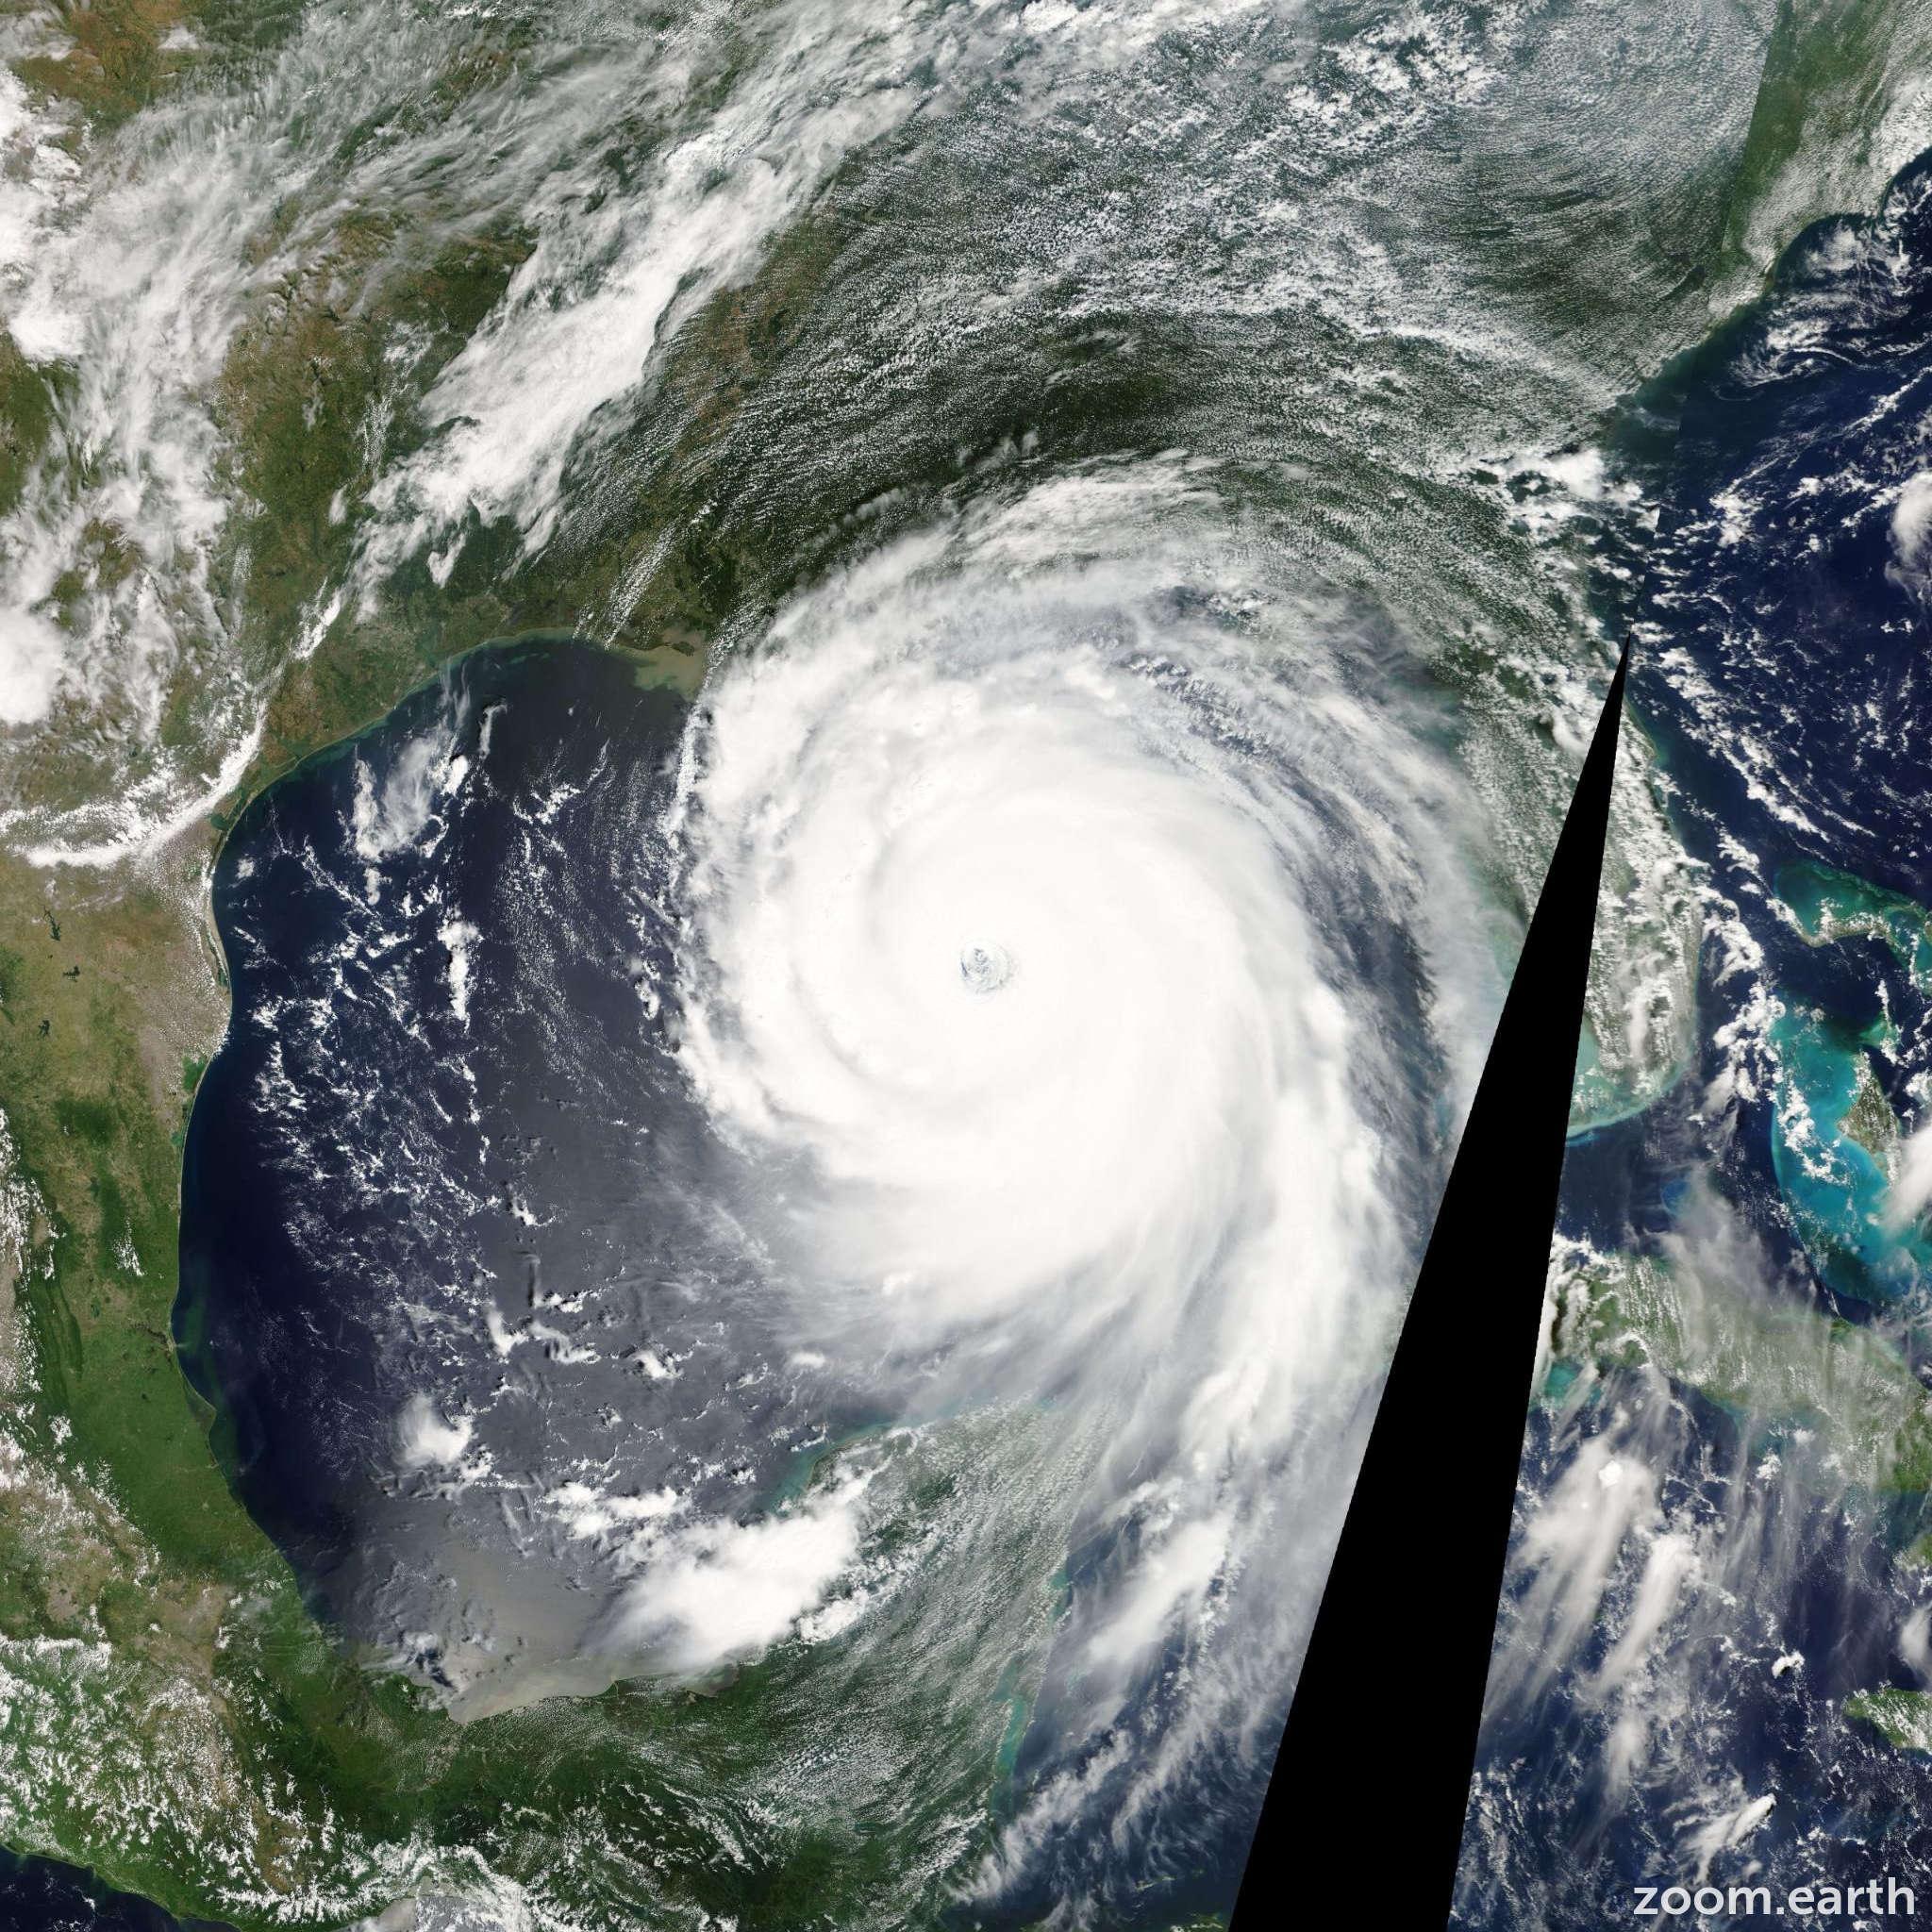 Satellite image of Hurricane Katrina 2005